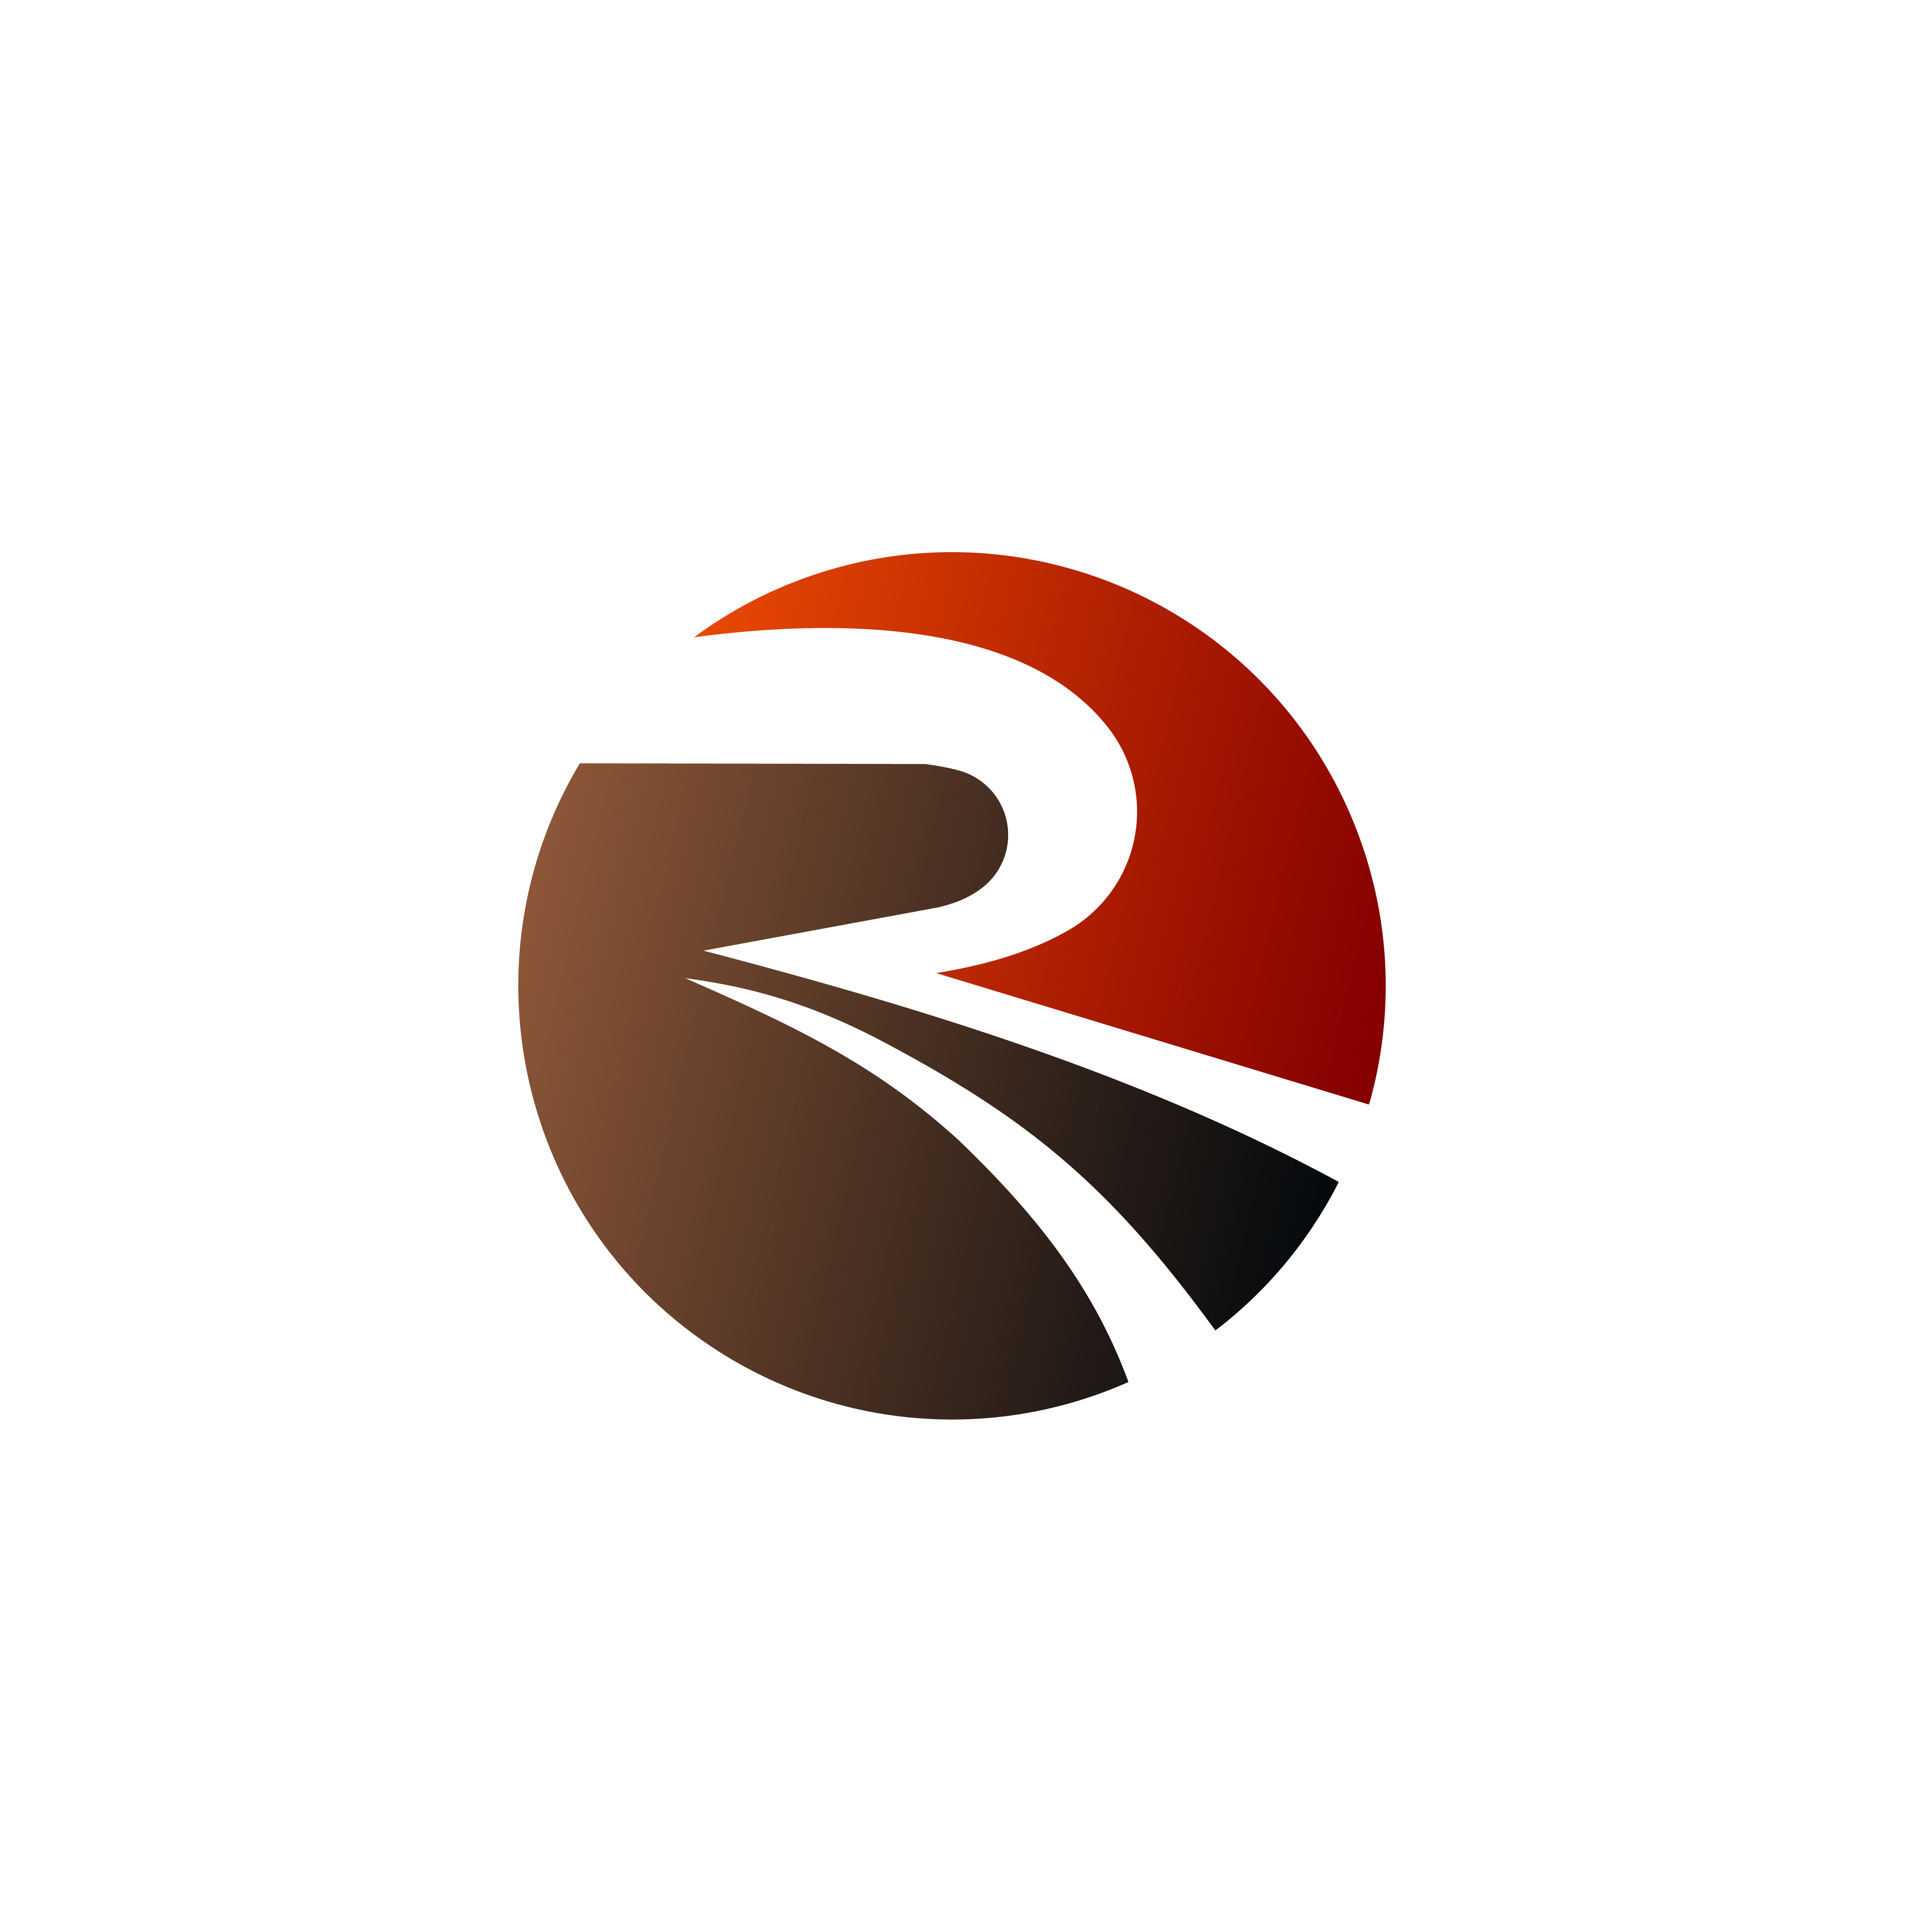 Letter R Circle Logo Design Concept Template 611154